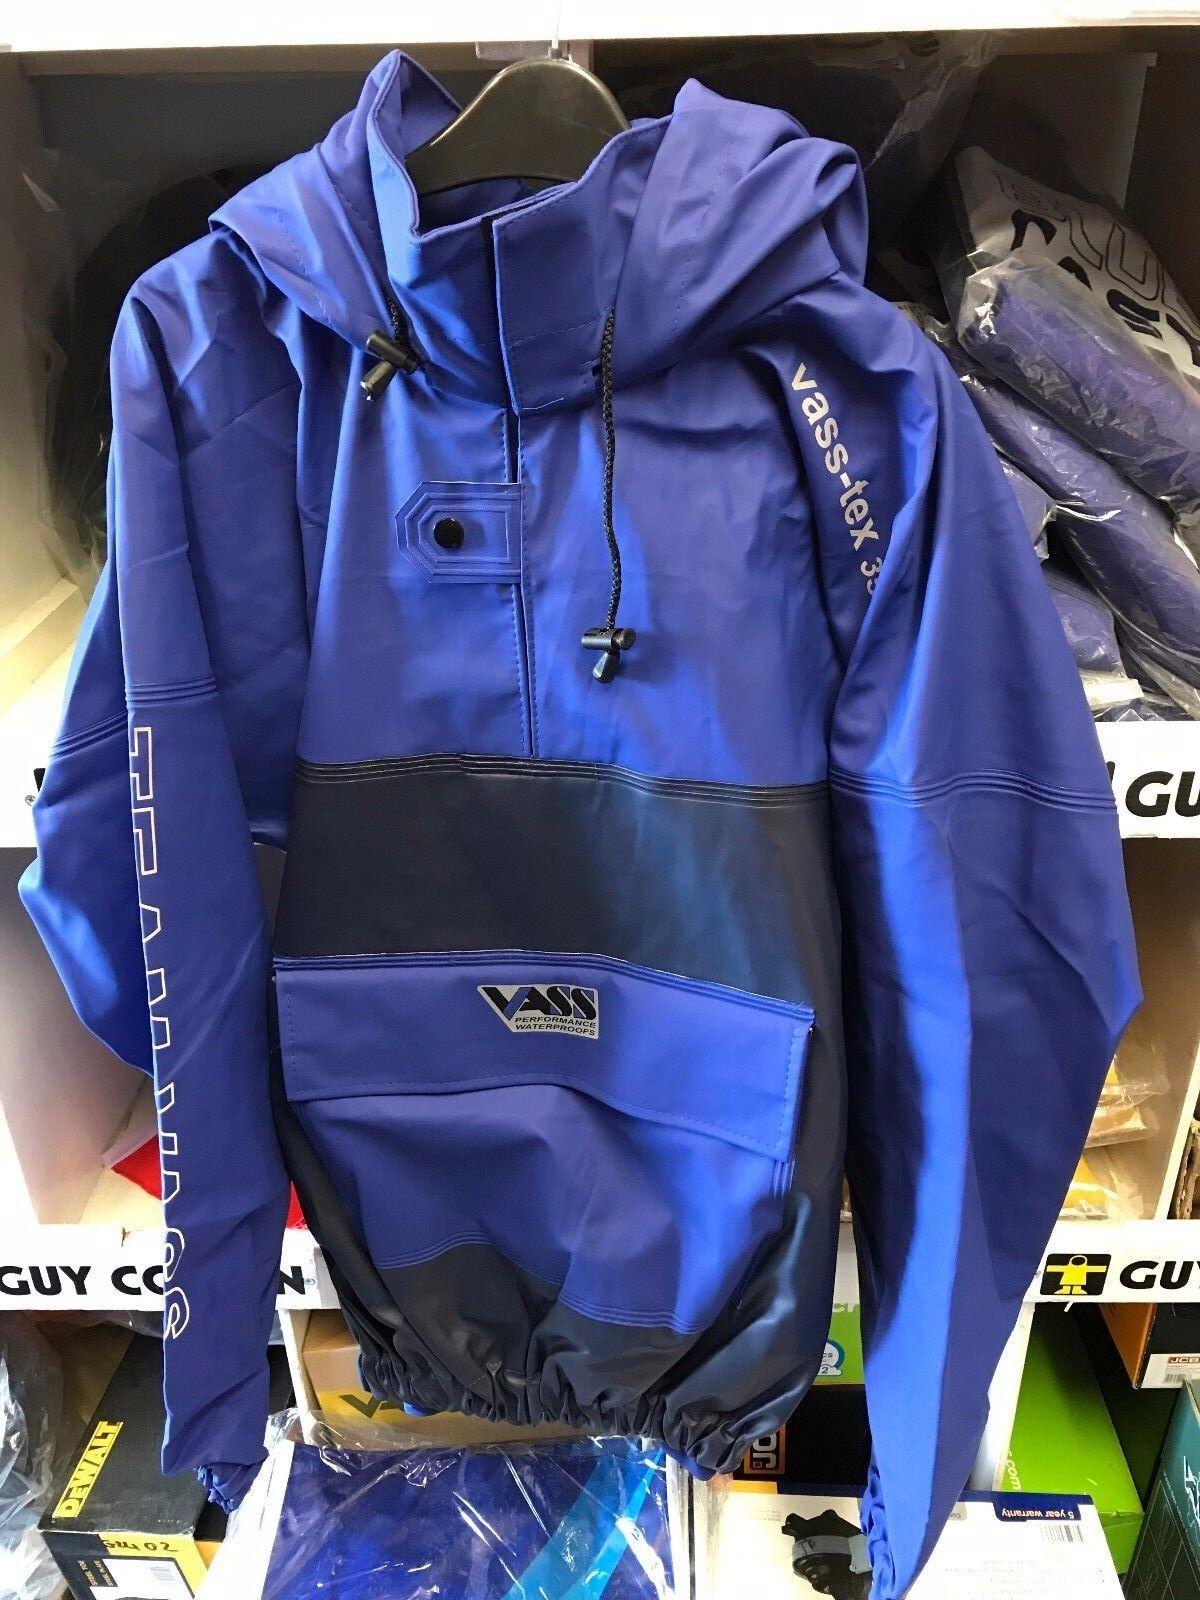 Vass-Tex 350 Heavy Duty Team Vass Smock Blau - 100% Waterproof & Windproof